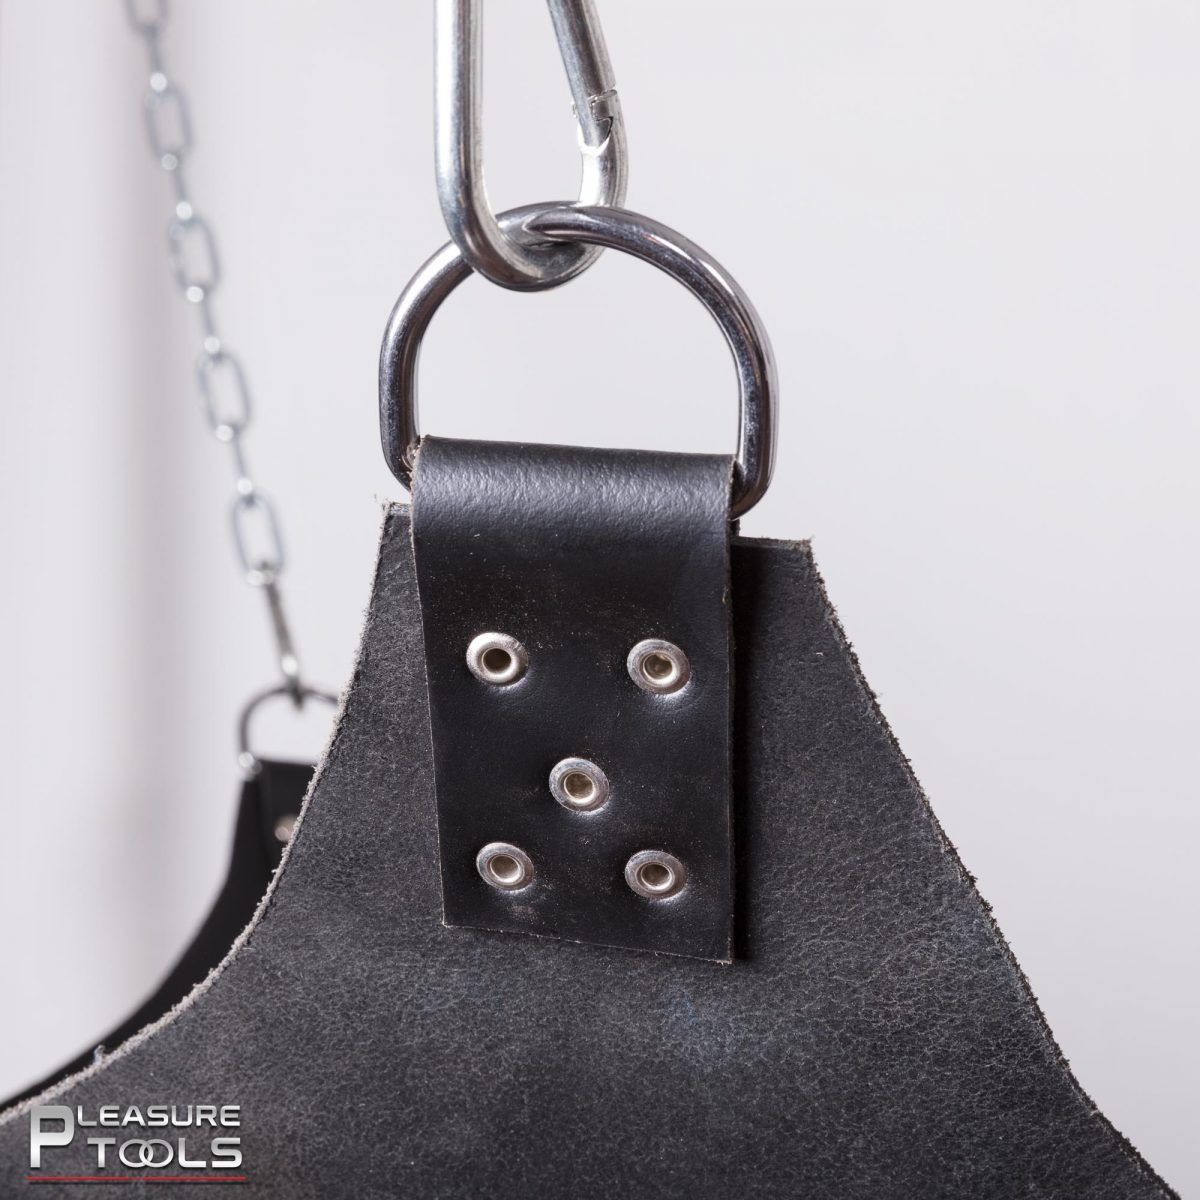 Pleasure Tools detail sling ophangpunt onderzijde